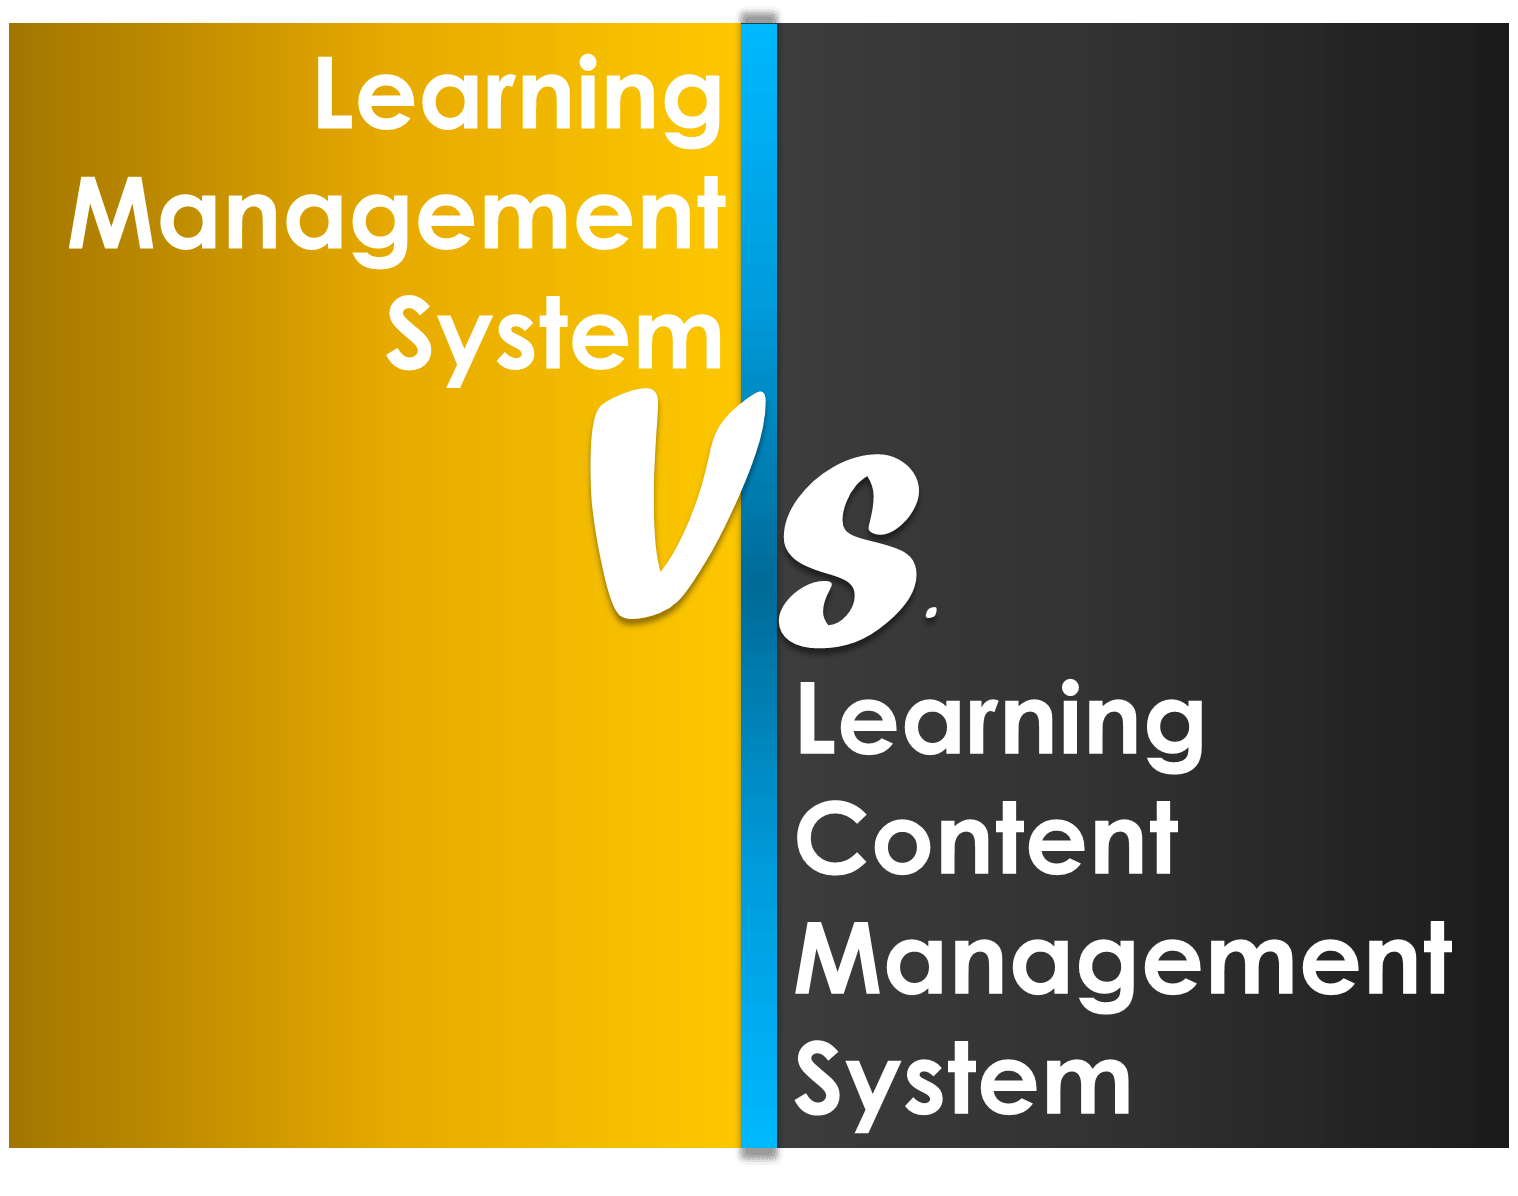 LMS vs LCMS: Learning Management System Vs Learning Content Management System